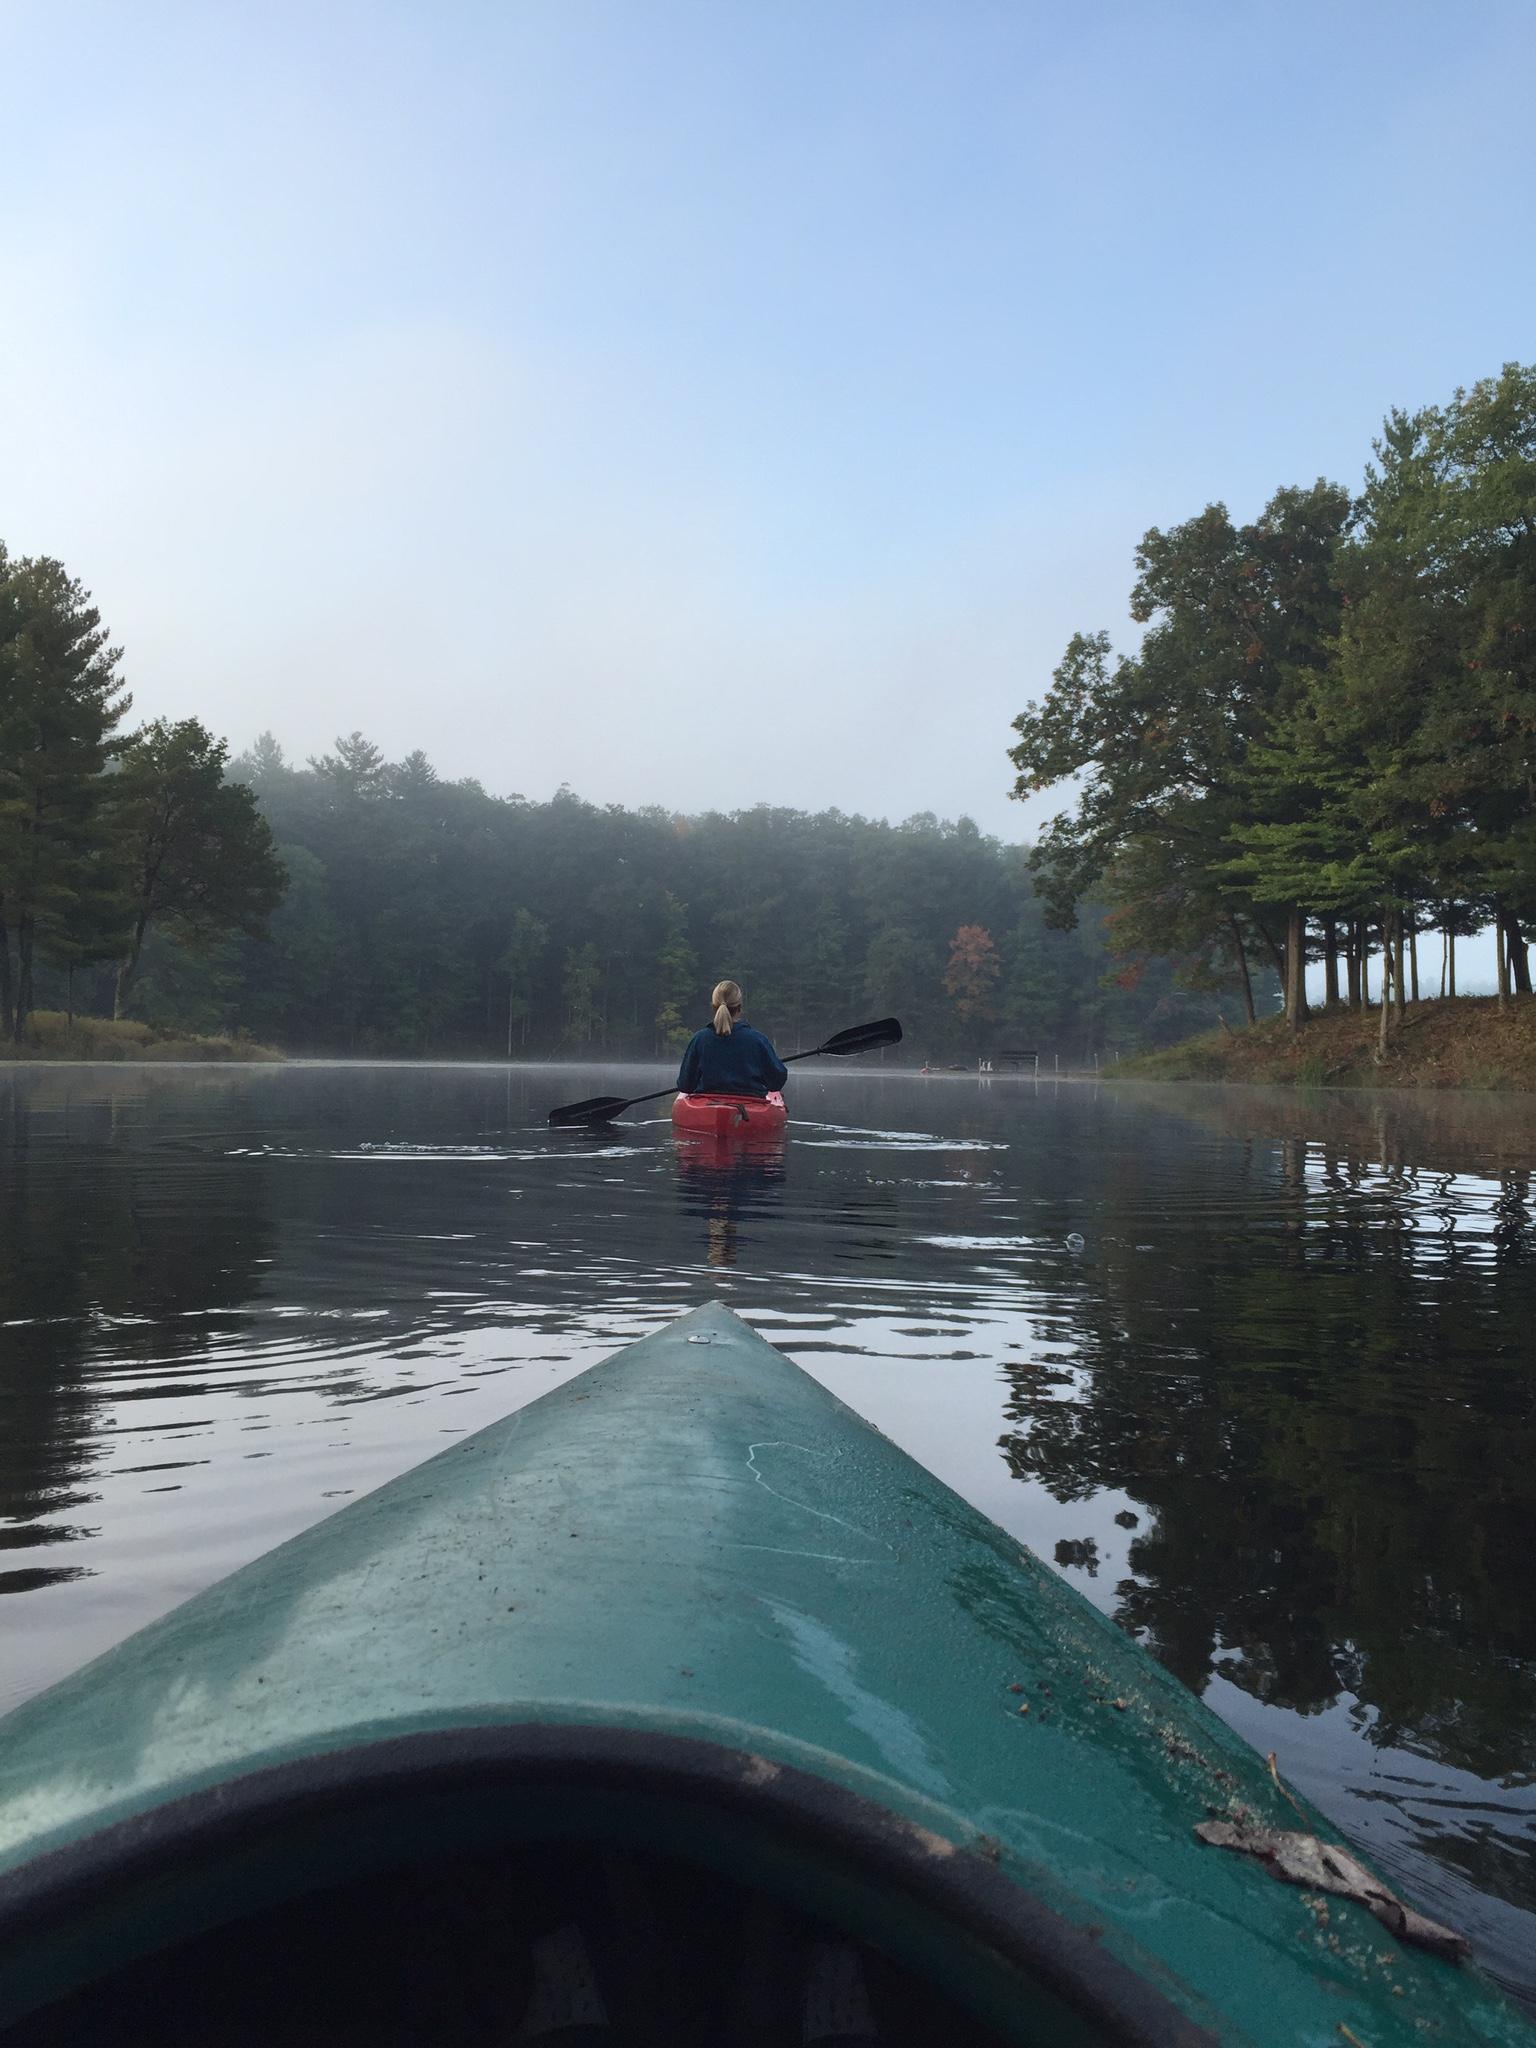 Kayaking didn't suck.